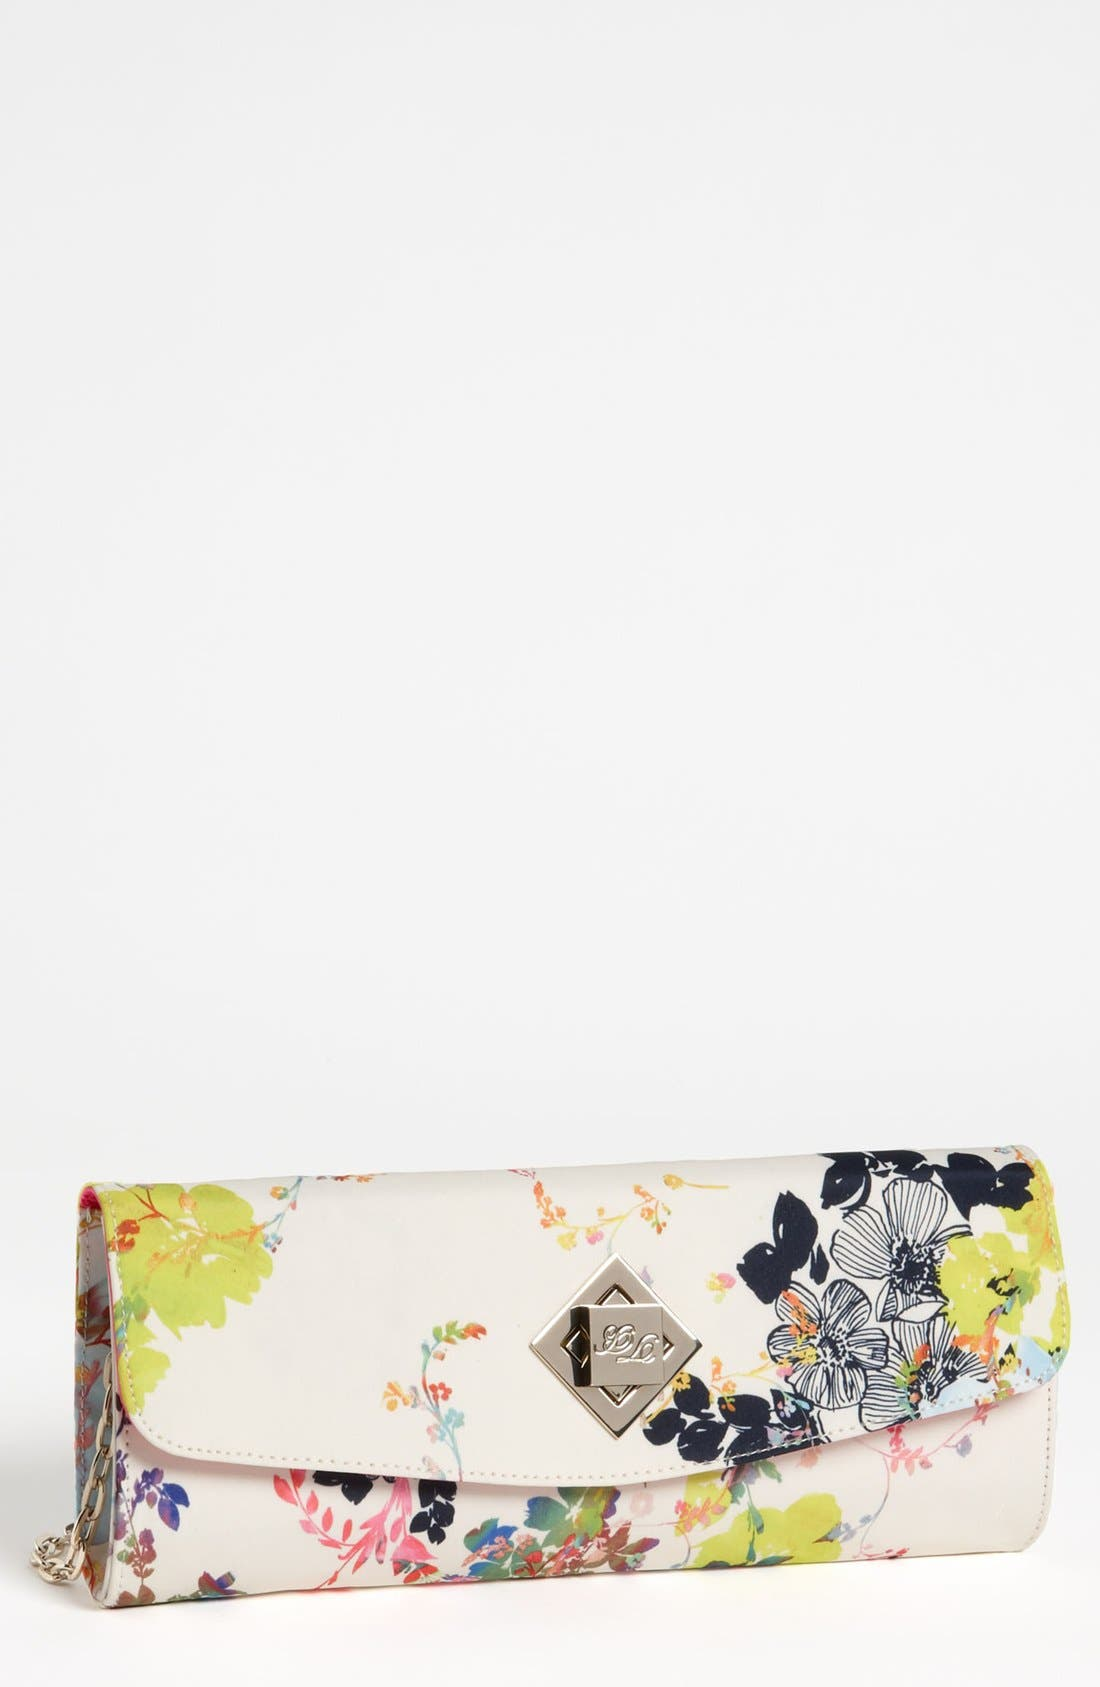 Alternate Image 1 Selected - Ted Baker London 'Summer Bloom' Twist Lock Envelope Clutch